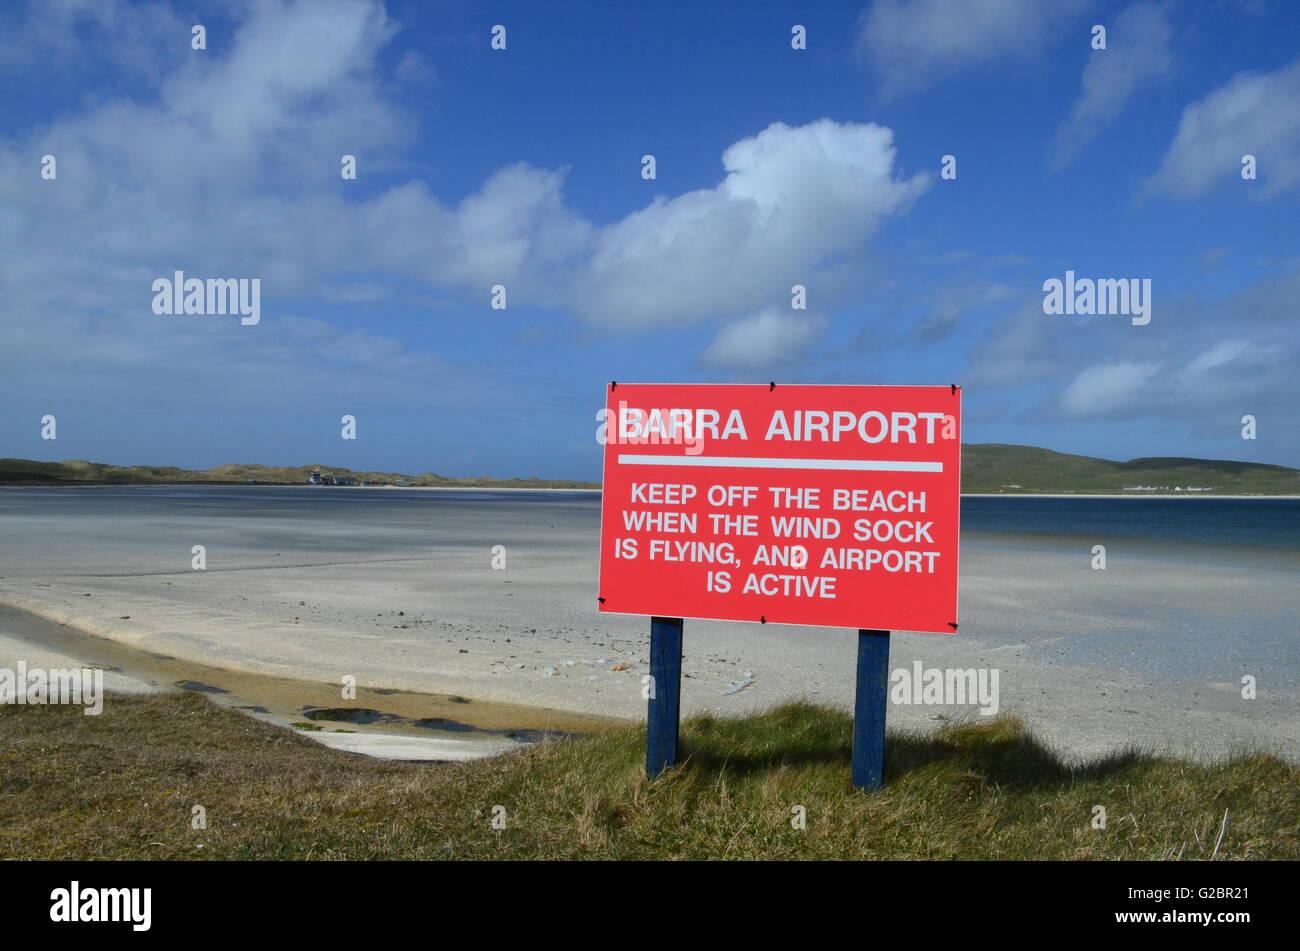 Barra Airport, Outer Hebrides, Scotland - Stock Image